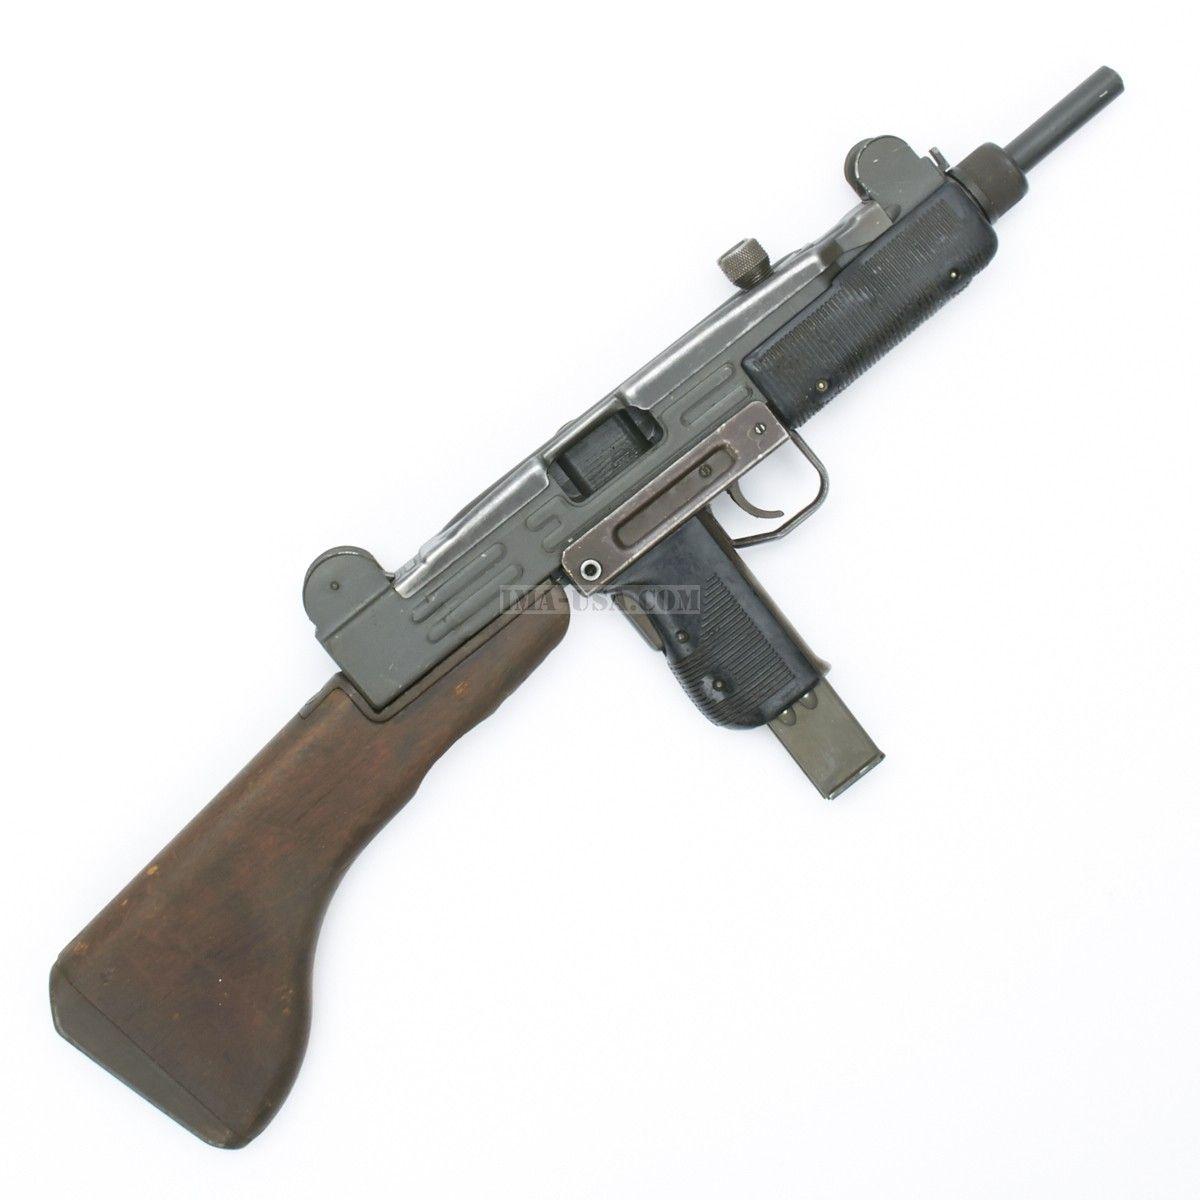 For sale trade imi uzi carbine made in israel 9mm - Original Israeli Uzi Display Submachine Gun With Wood Stock Ima Usa Com